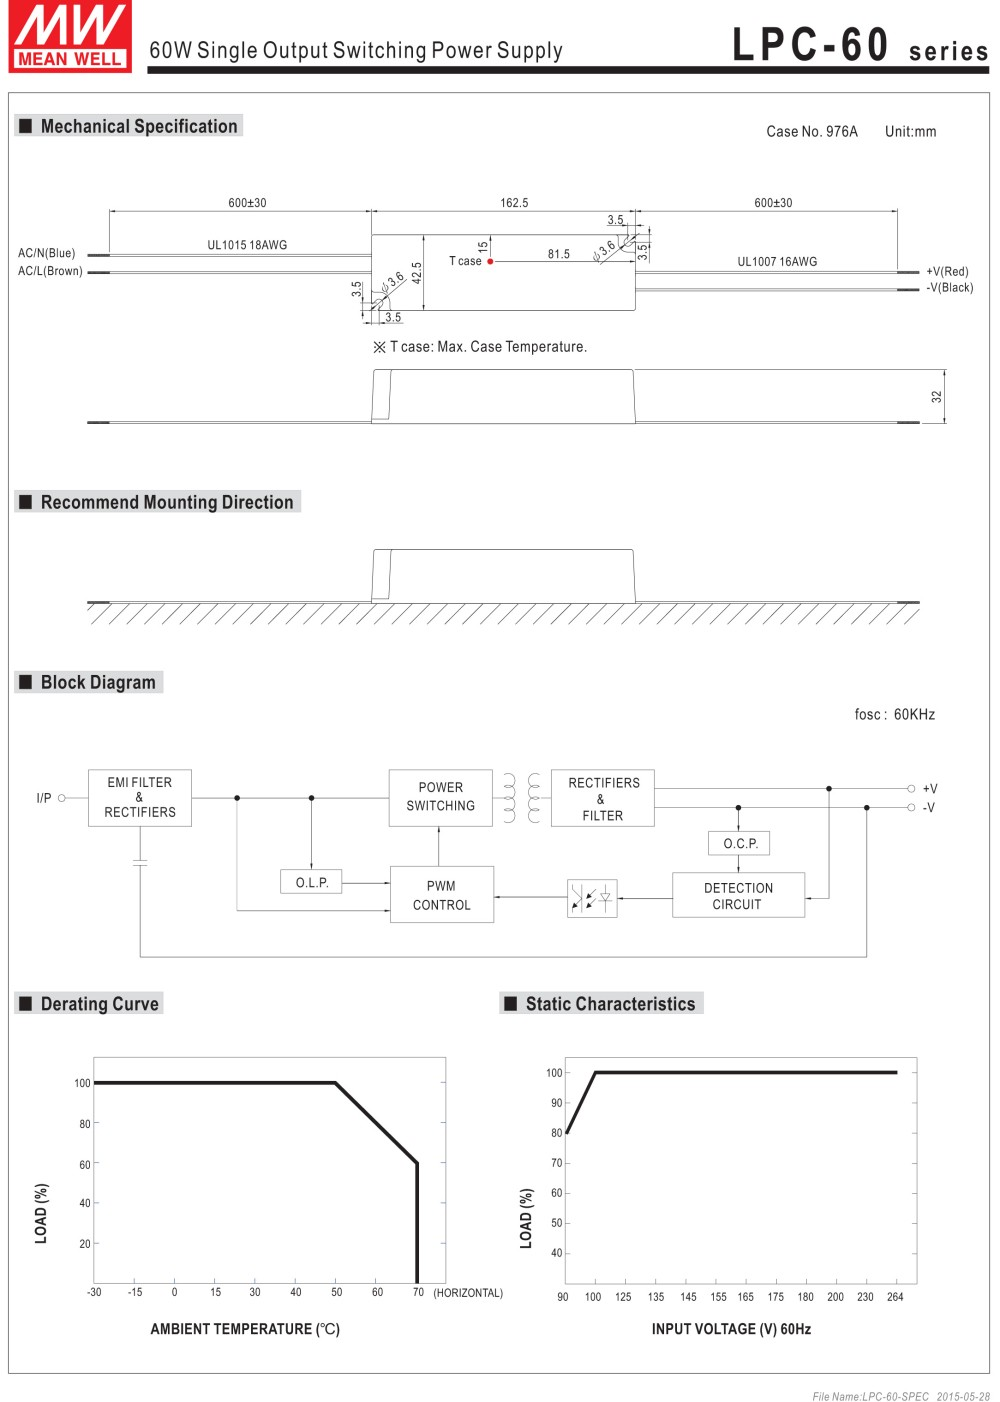 HTB1qKnuXwvGK1Jjy0Fbq6z4vVXav - Meanwell LPC-60-1050 constant current led power supply 9-48VDC output 50.4W 1050mA waterproof driver for Led strip lighting